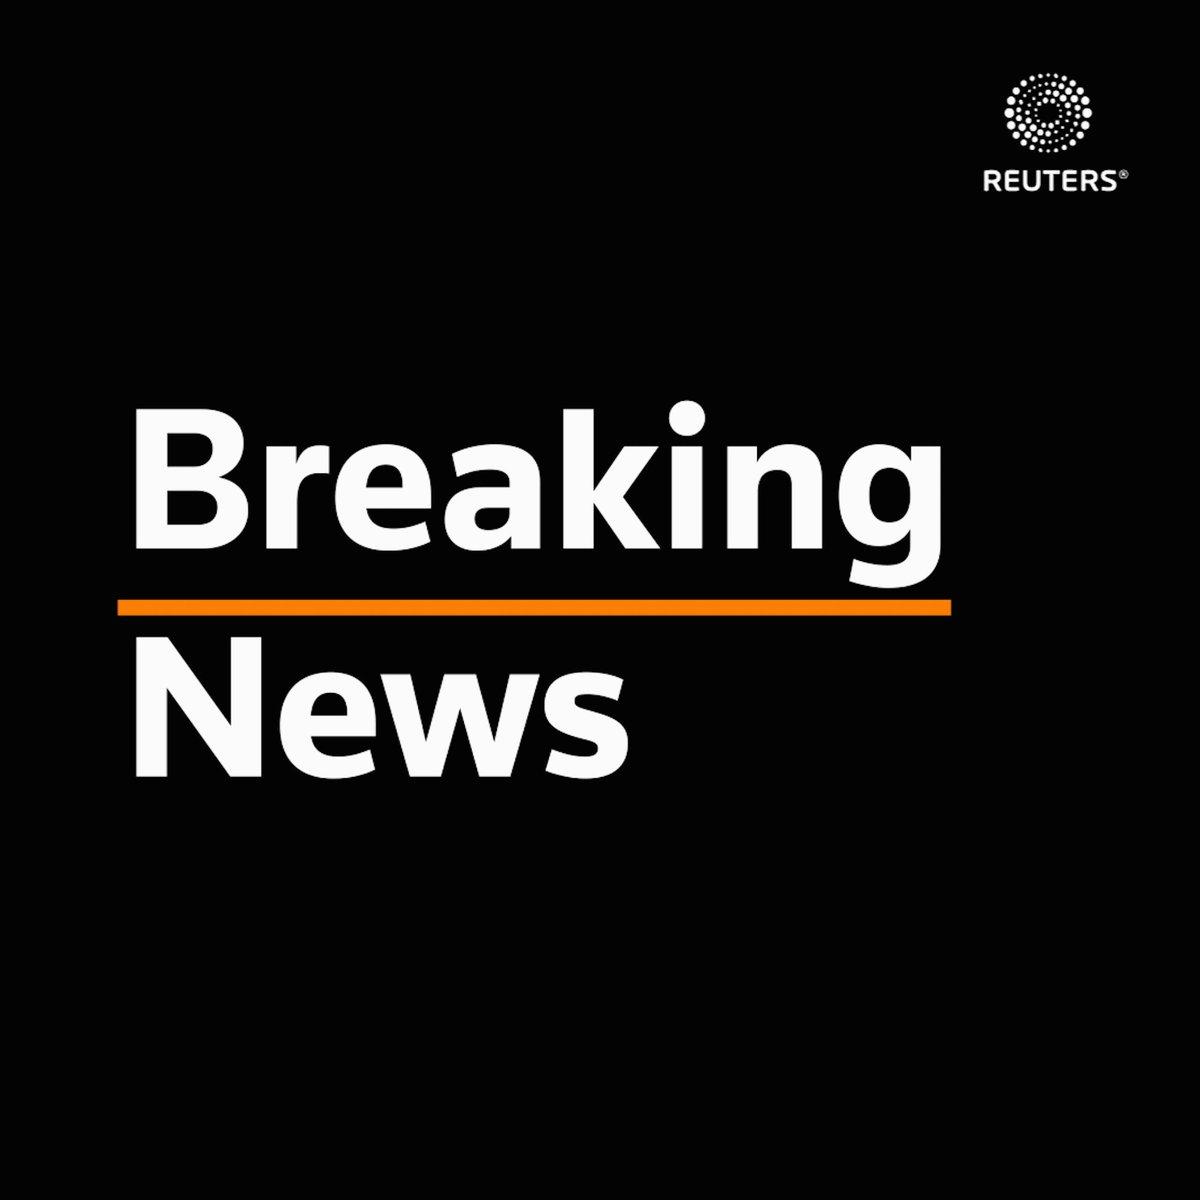 Philip Morris and Altria Group end merger discussions https://t.co/tXgOxk5slC https://t.co/K7nvfop9an